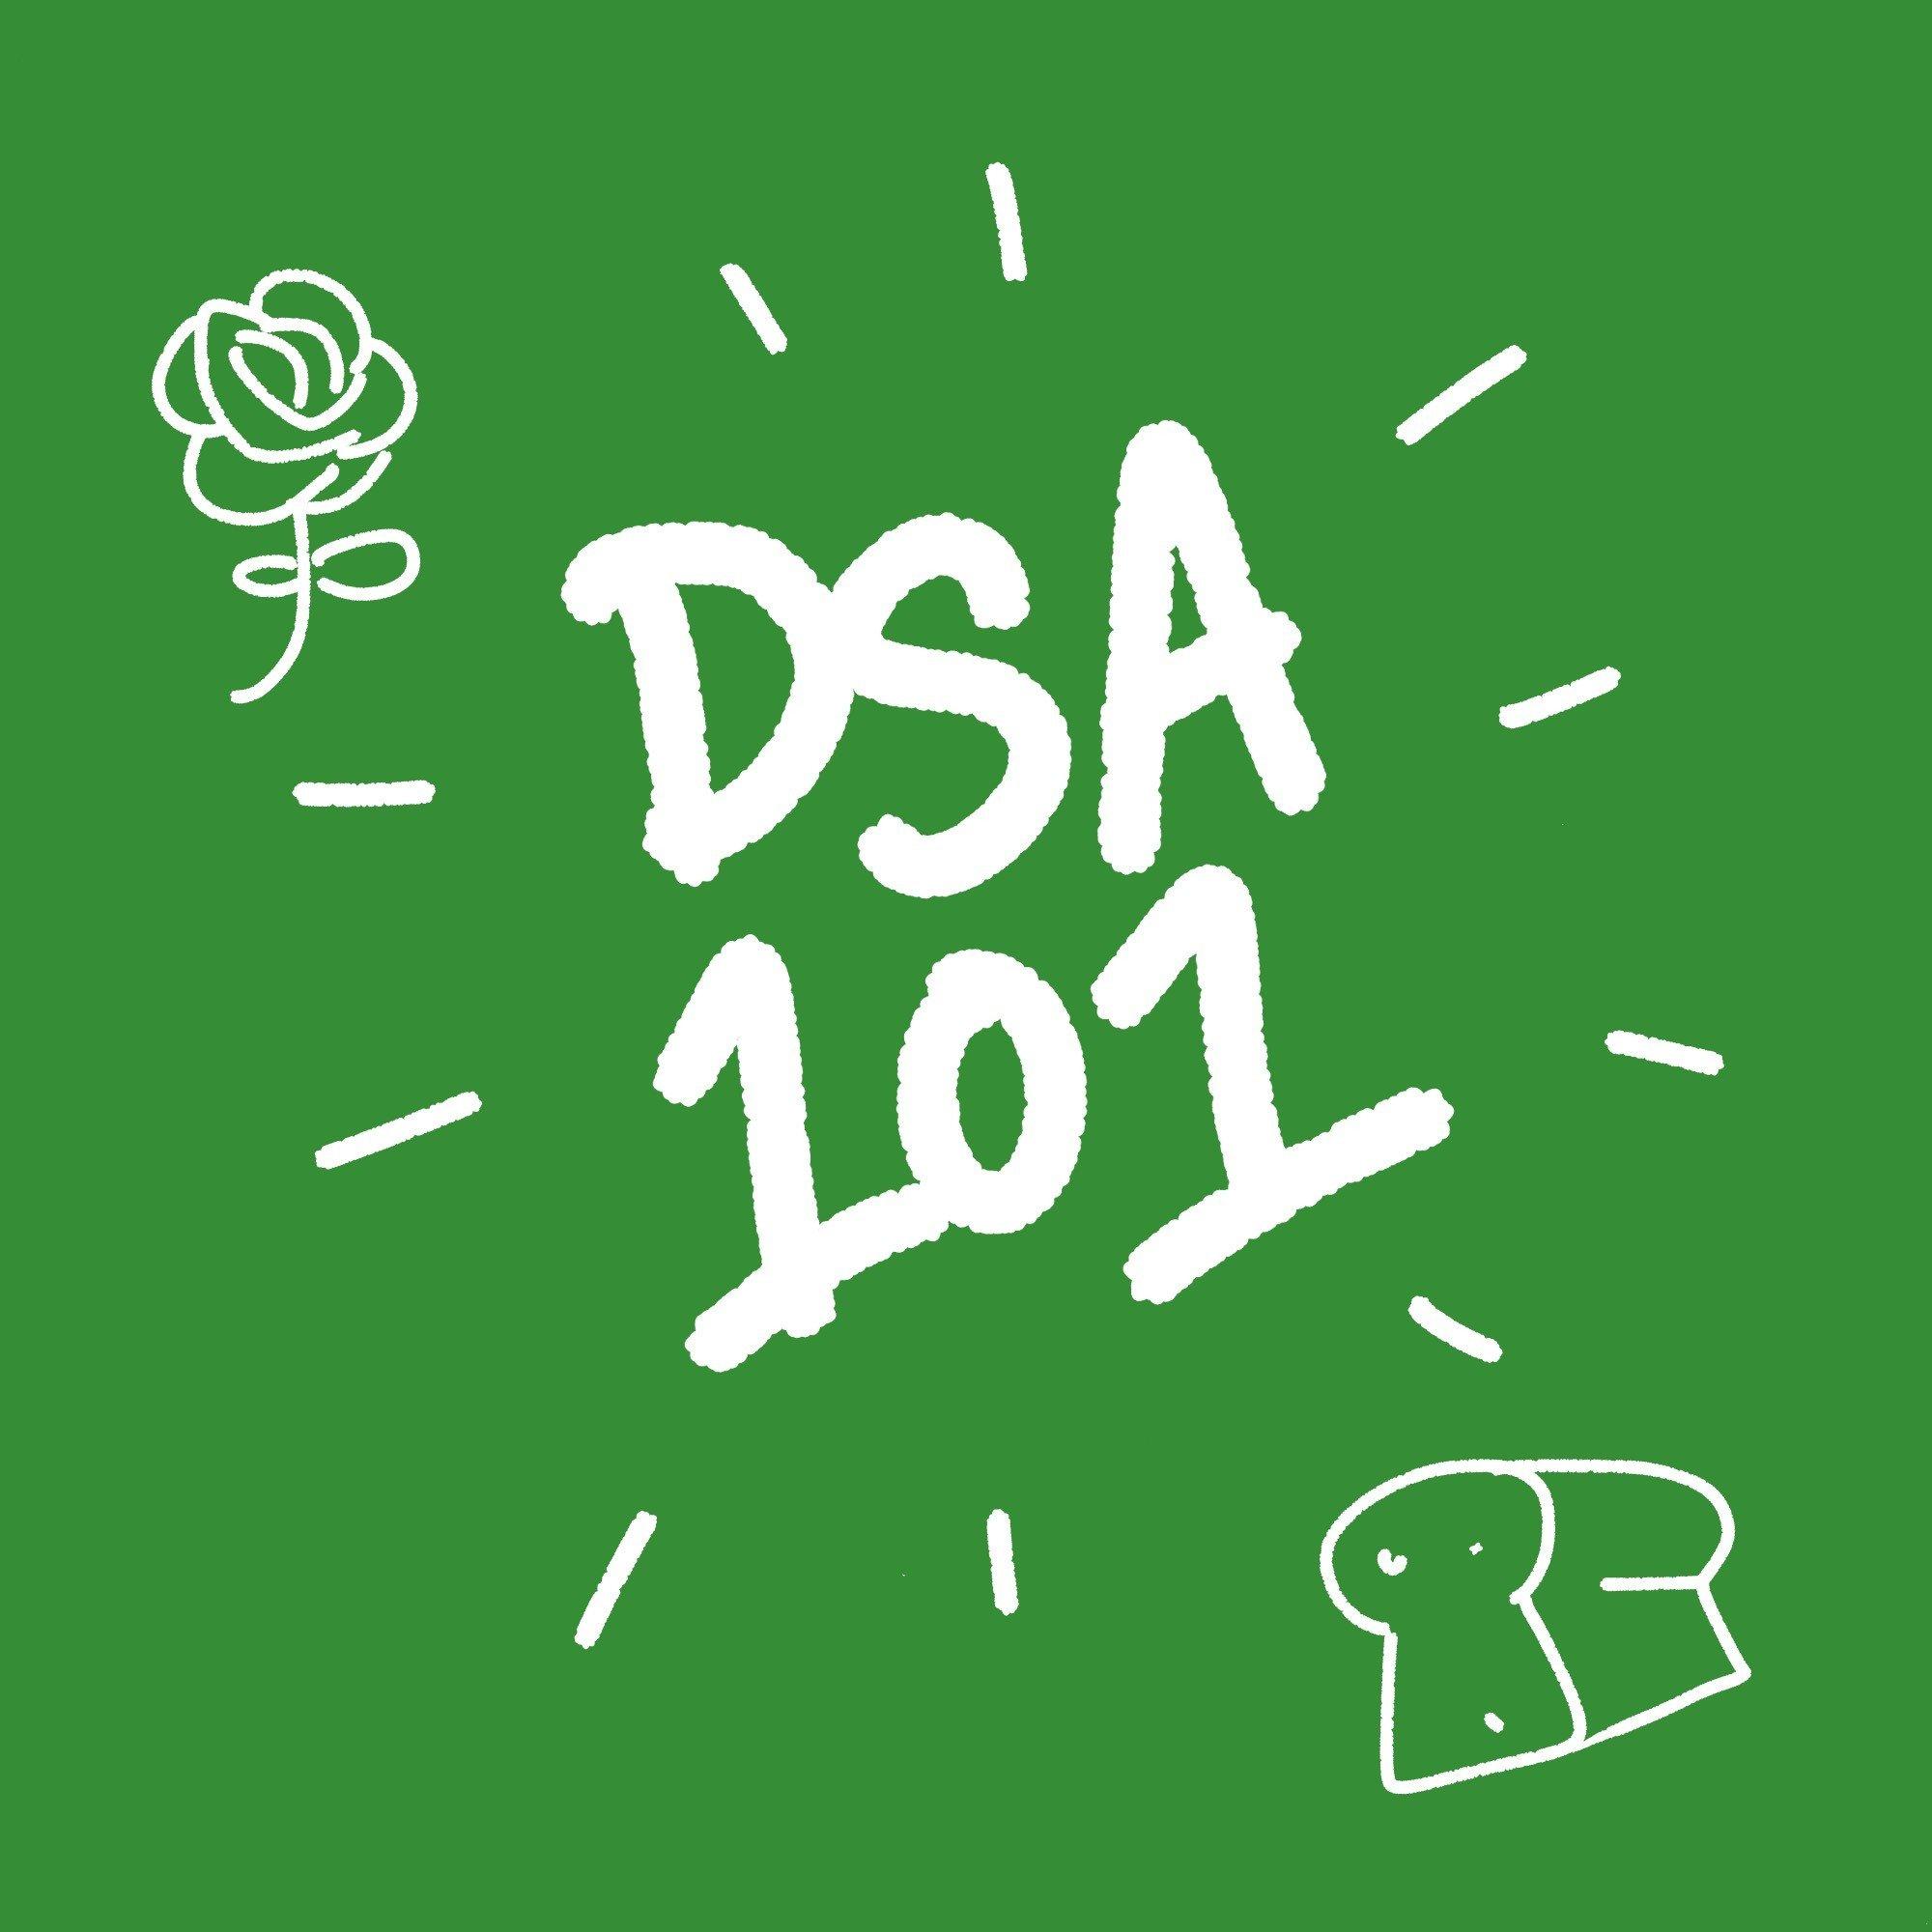 DSA 101 Flyer